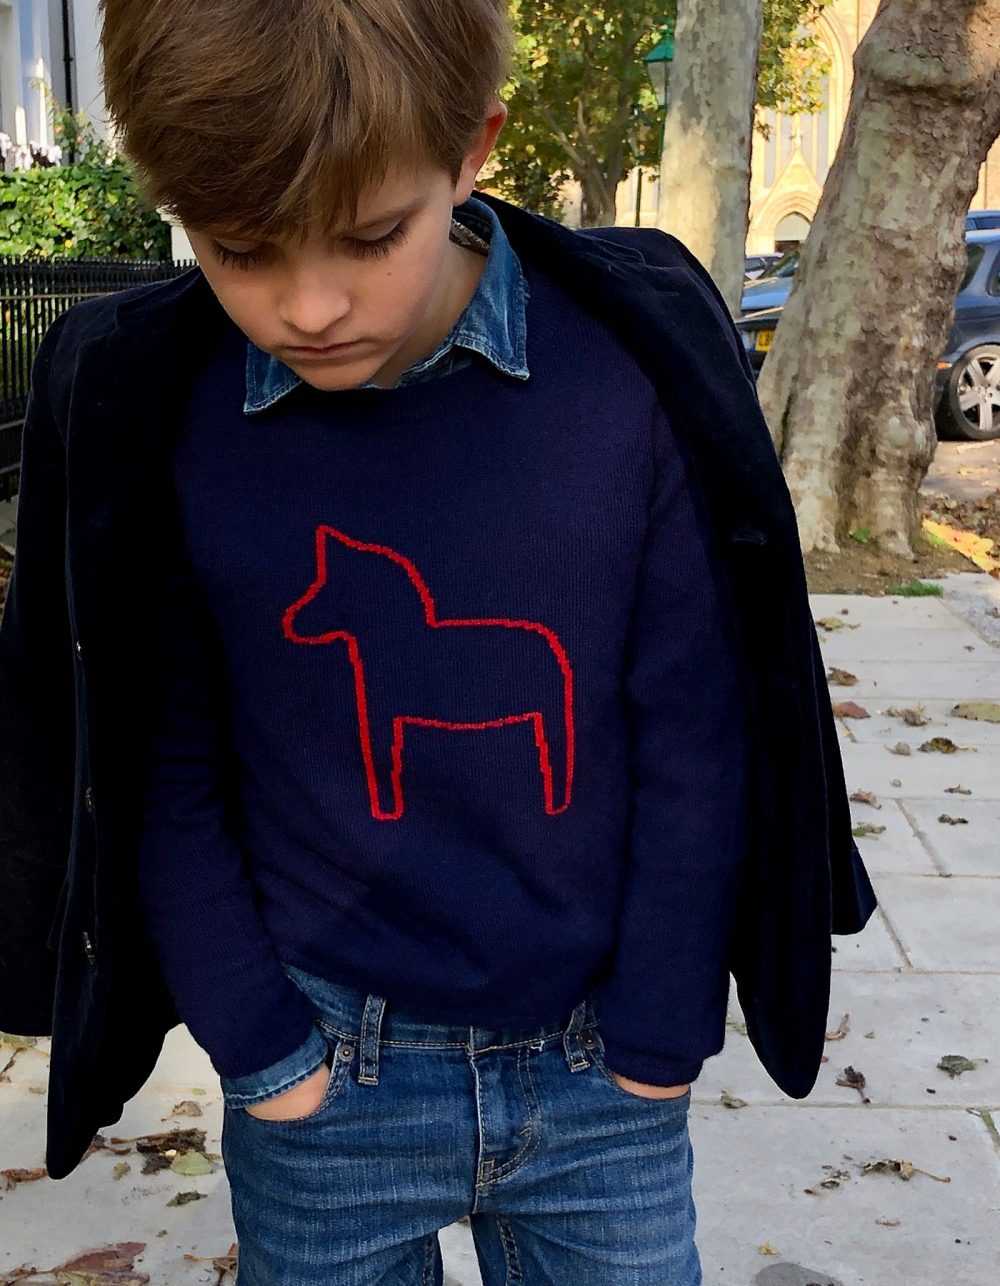 Boy wearing childrens cashmere, a malin darlin Little Pony navy cashmere jumper, under a jacket.